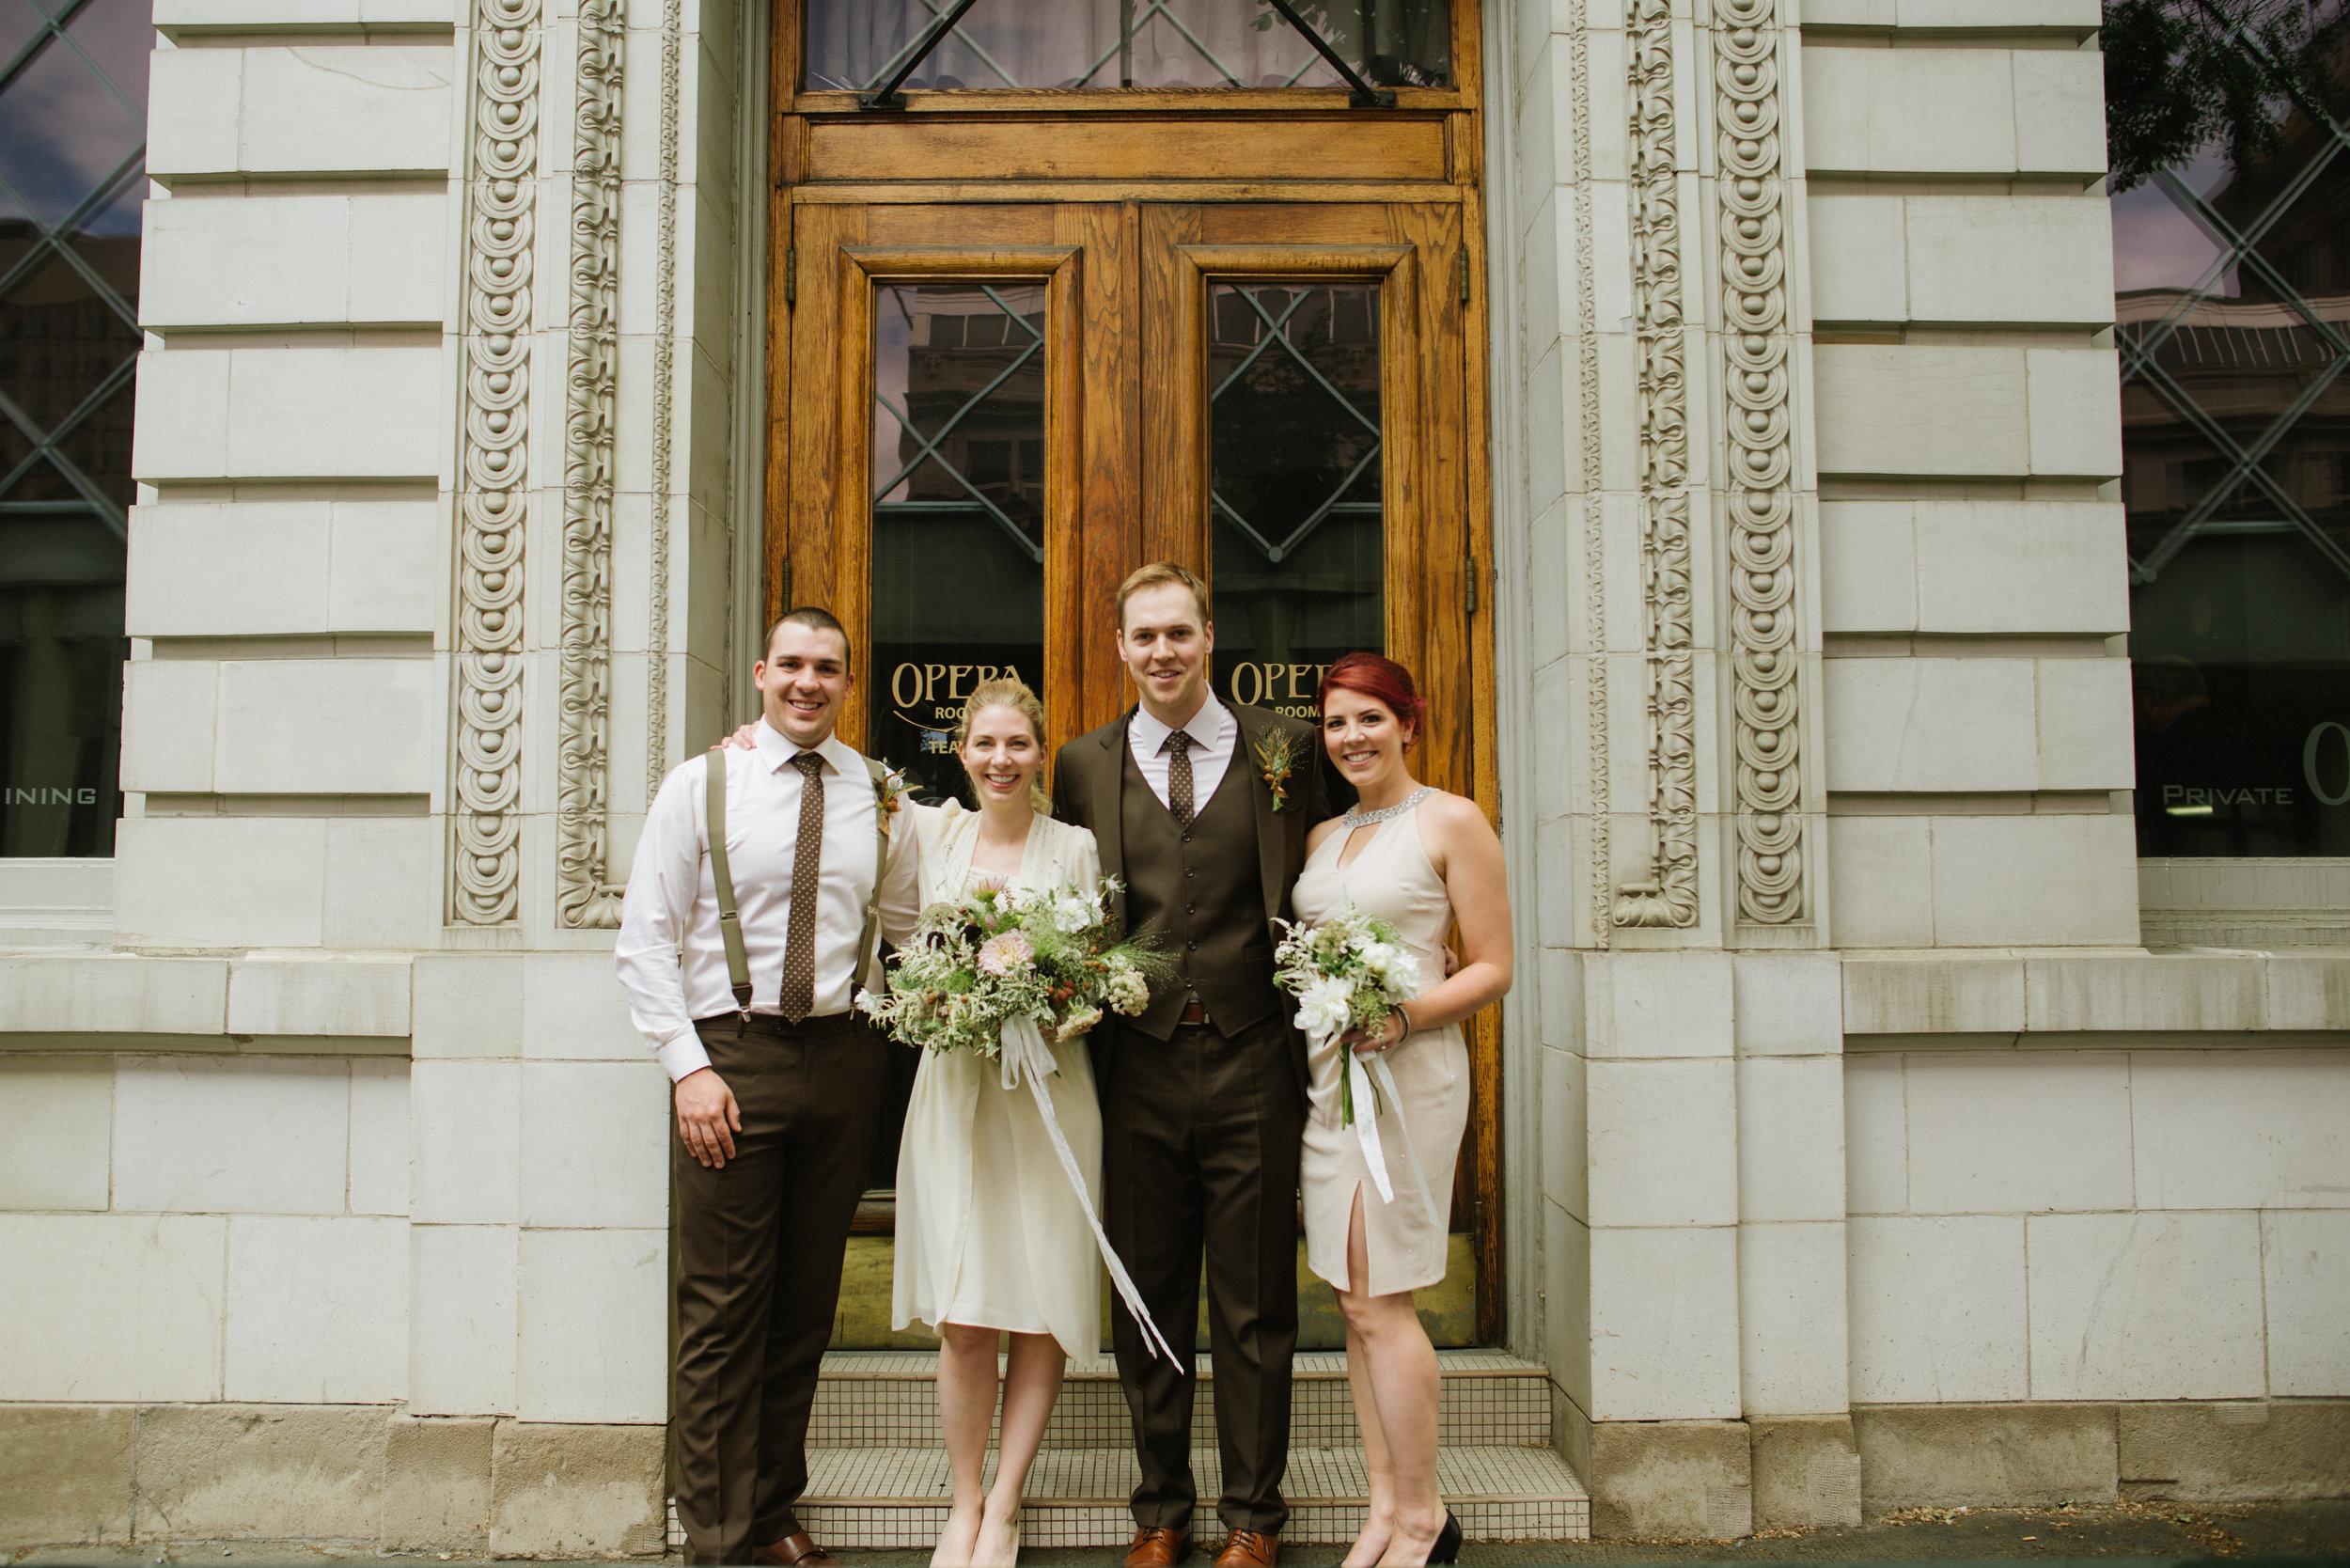 Teatro_Wedding_Calgary_Wedding_Photography_Vanessa_Tom_Married_2018_HR315.jpg